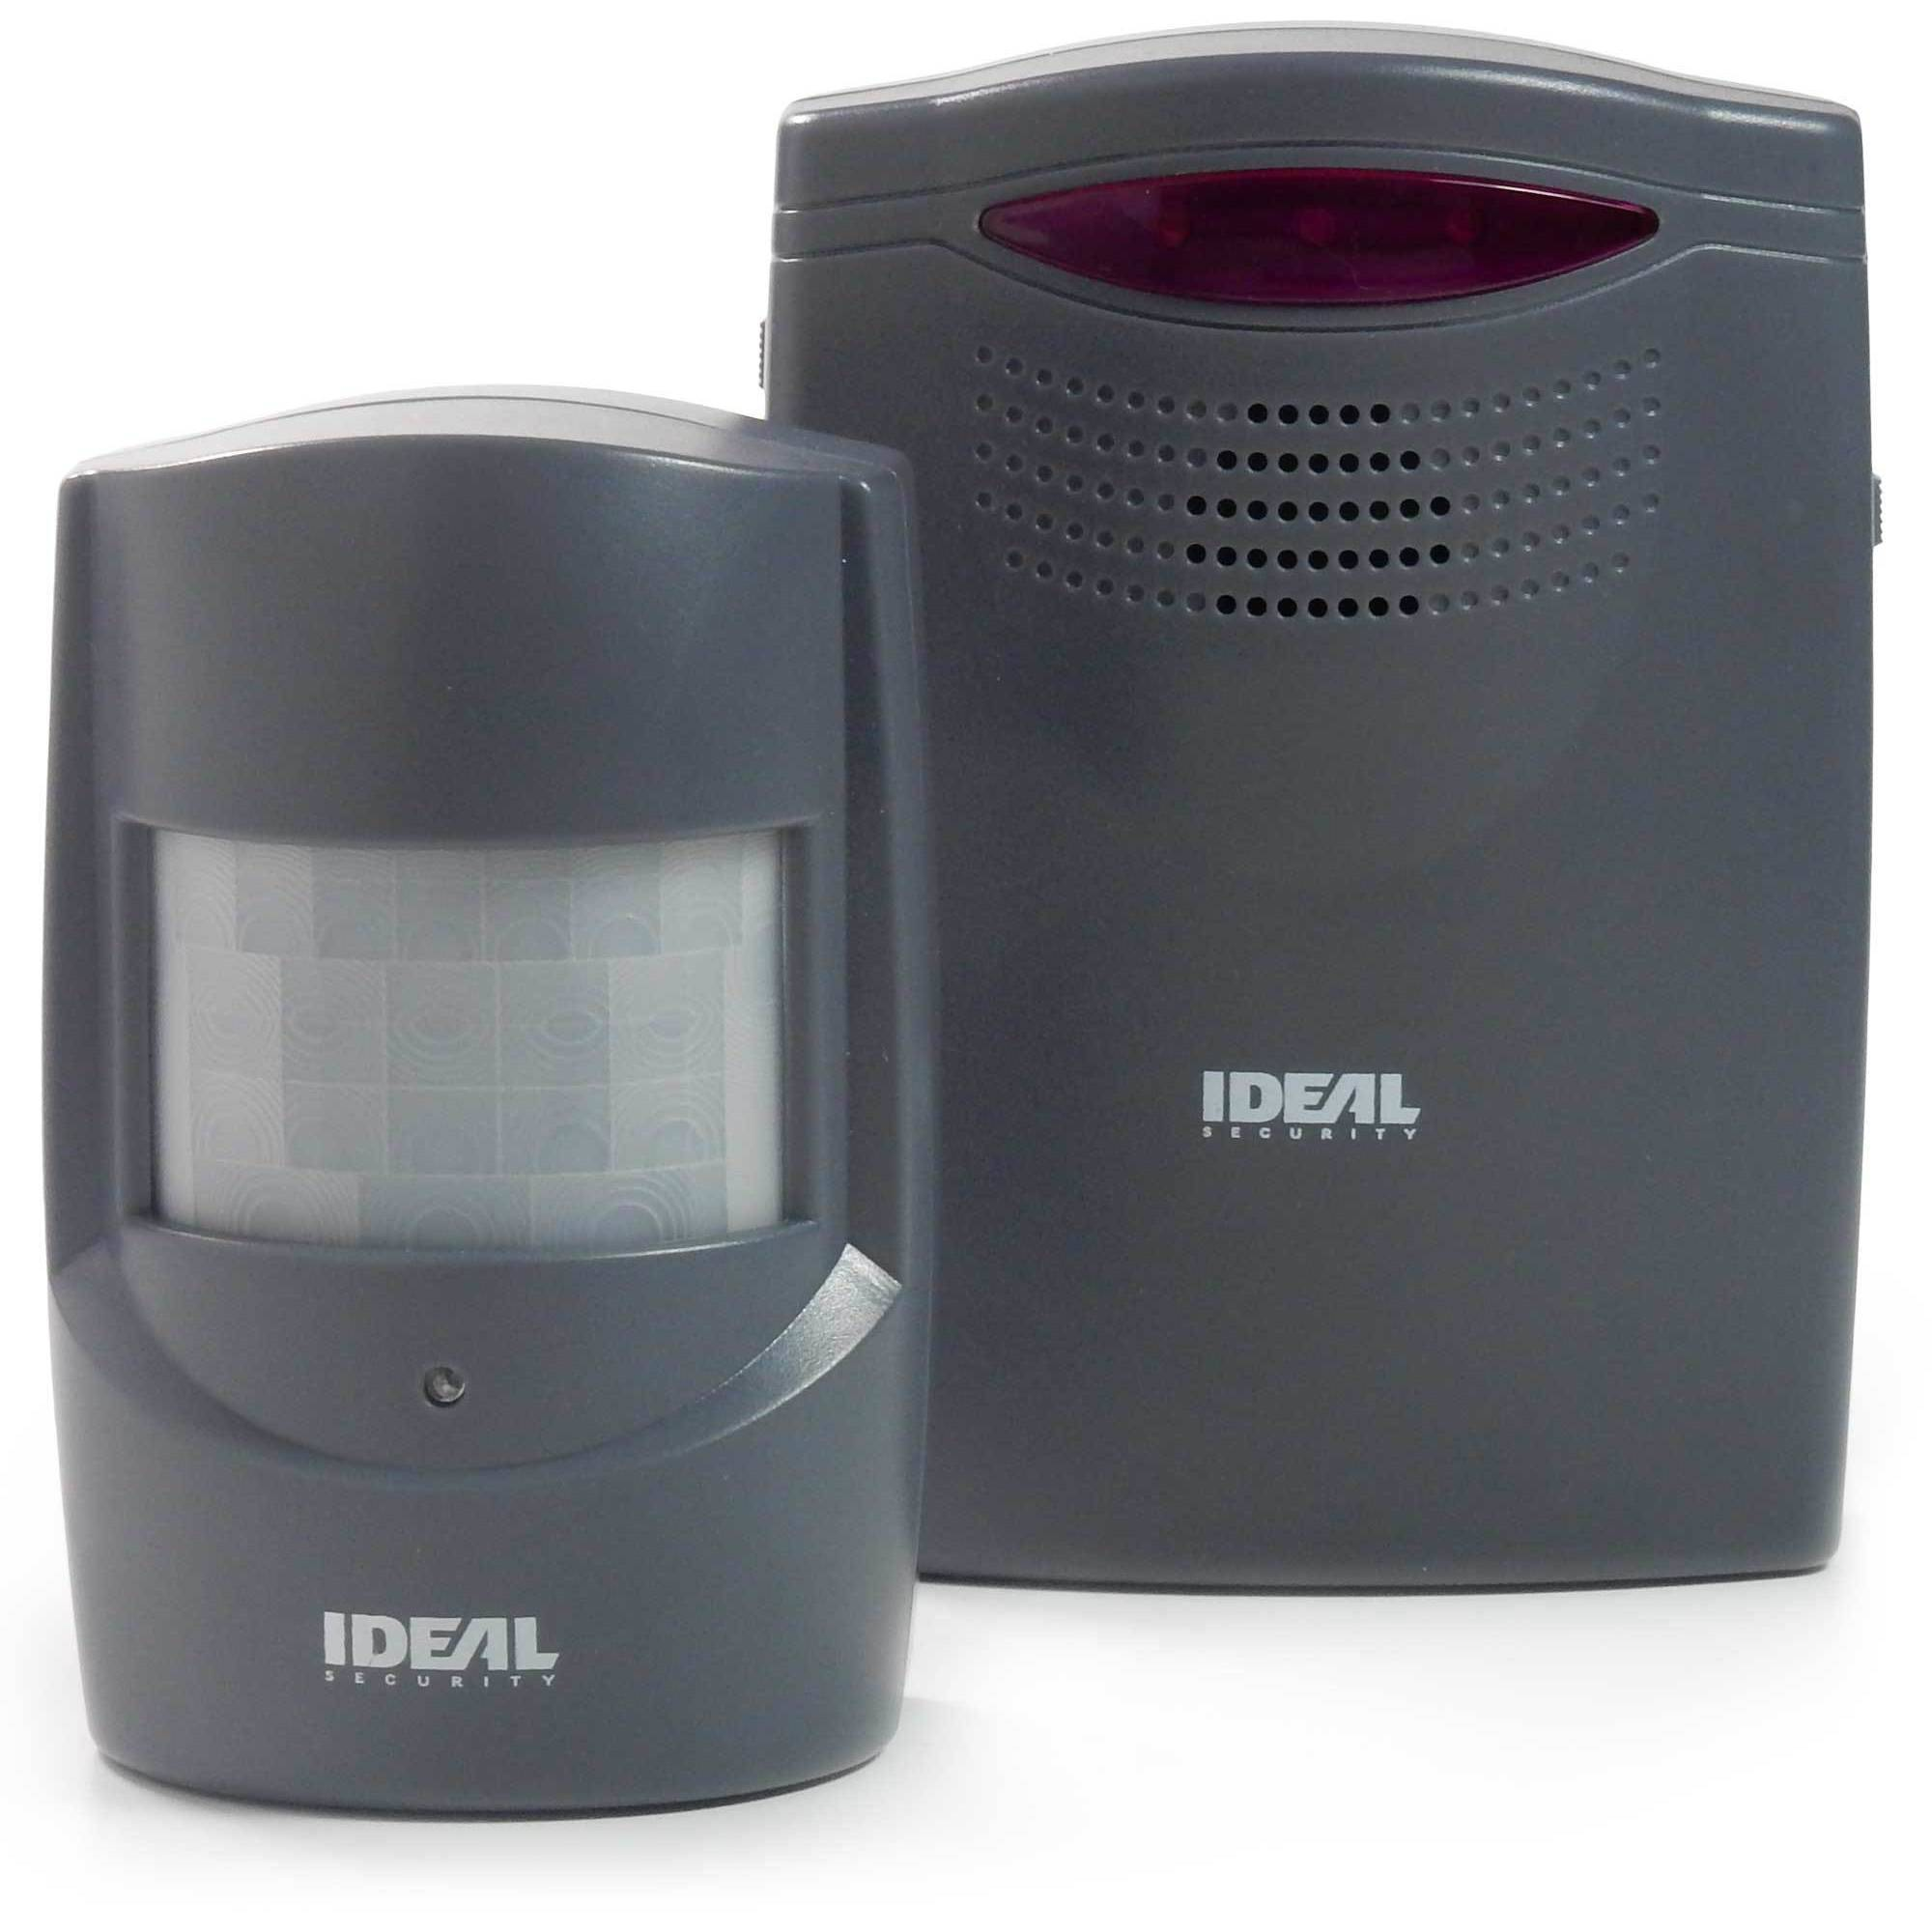 Wireless, expandable motion sensor alarm & alert Color Charcoal Grey